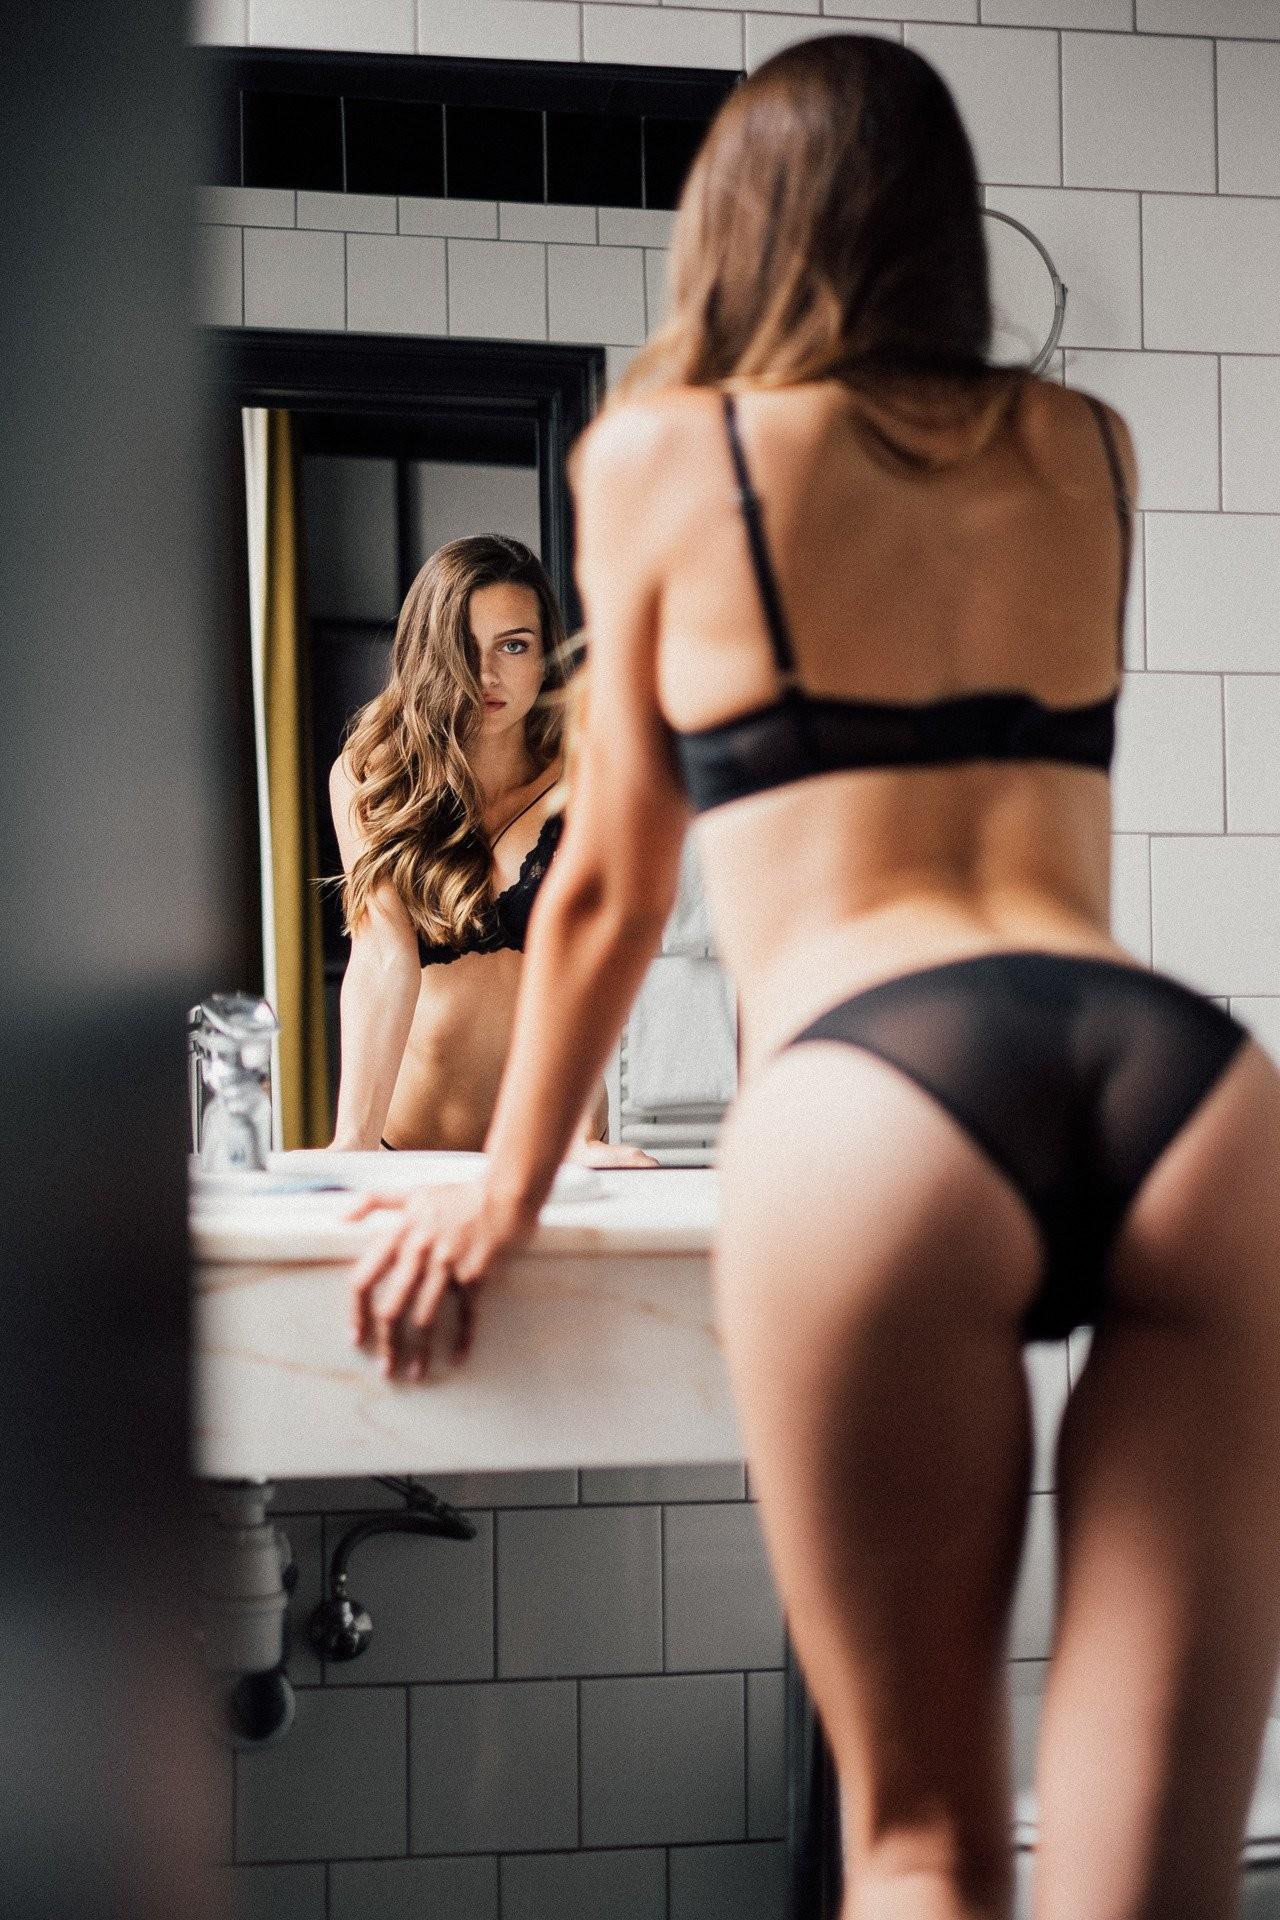 Перед зеркалом. Фотограф неизвестен